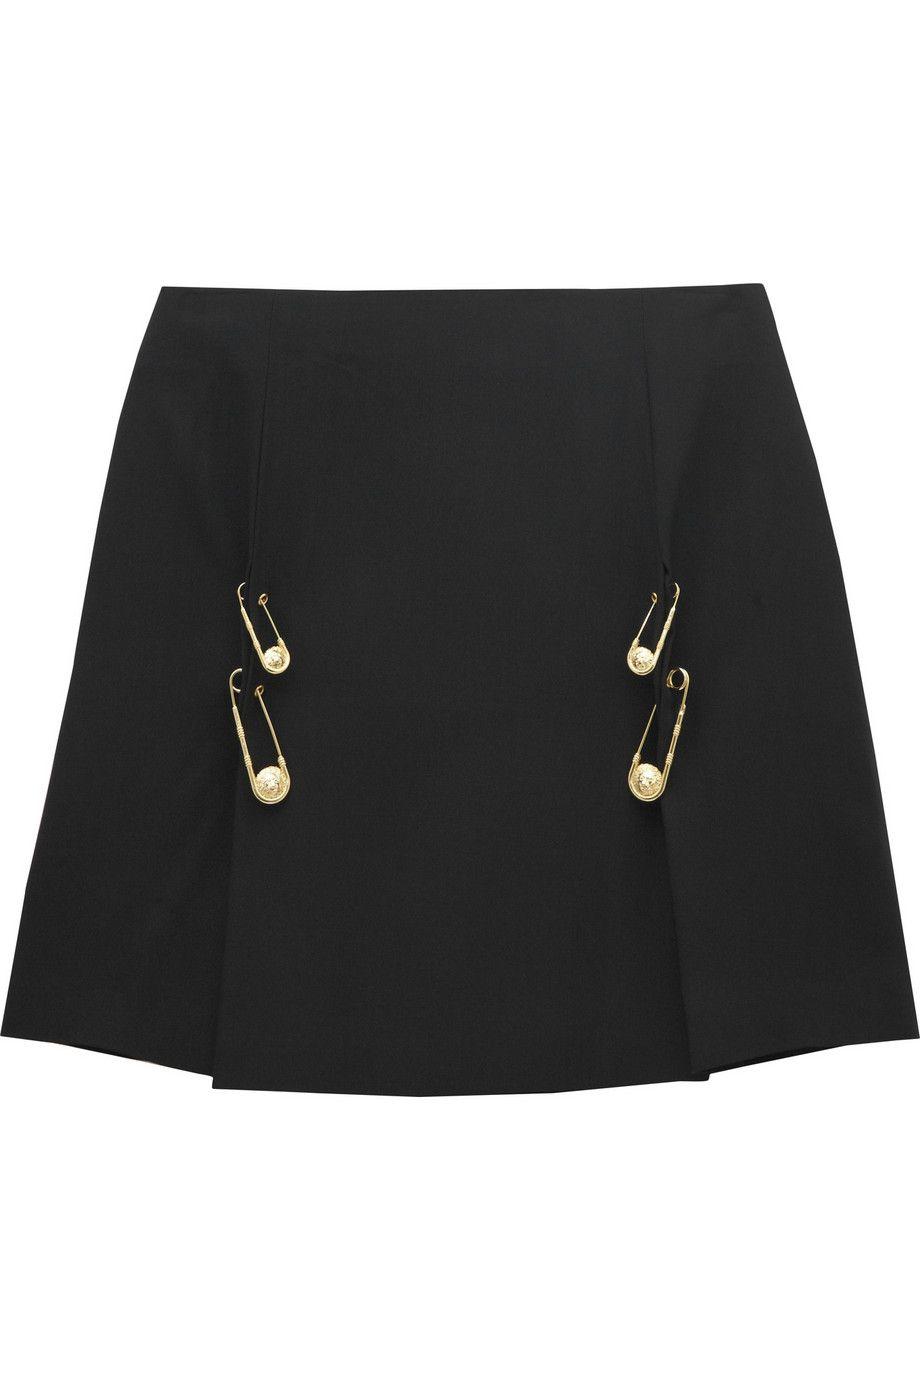 Versus | Safety pin-embellished crepe mini skirt